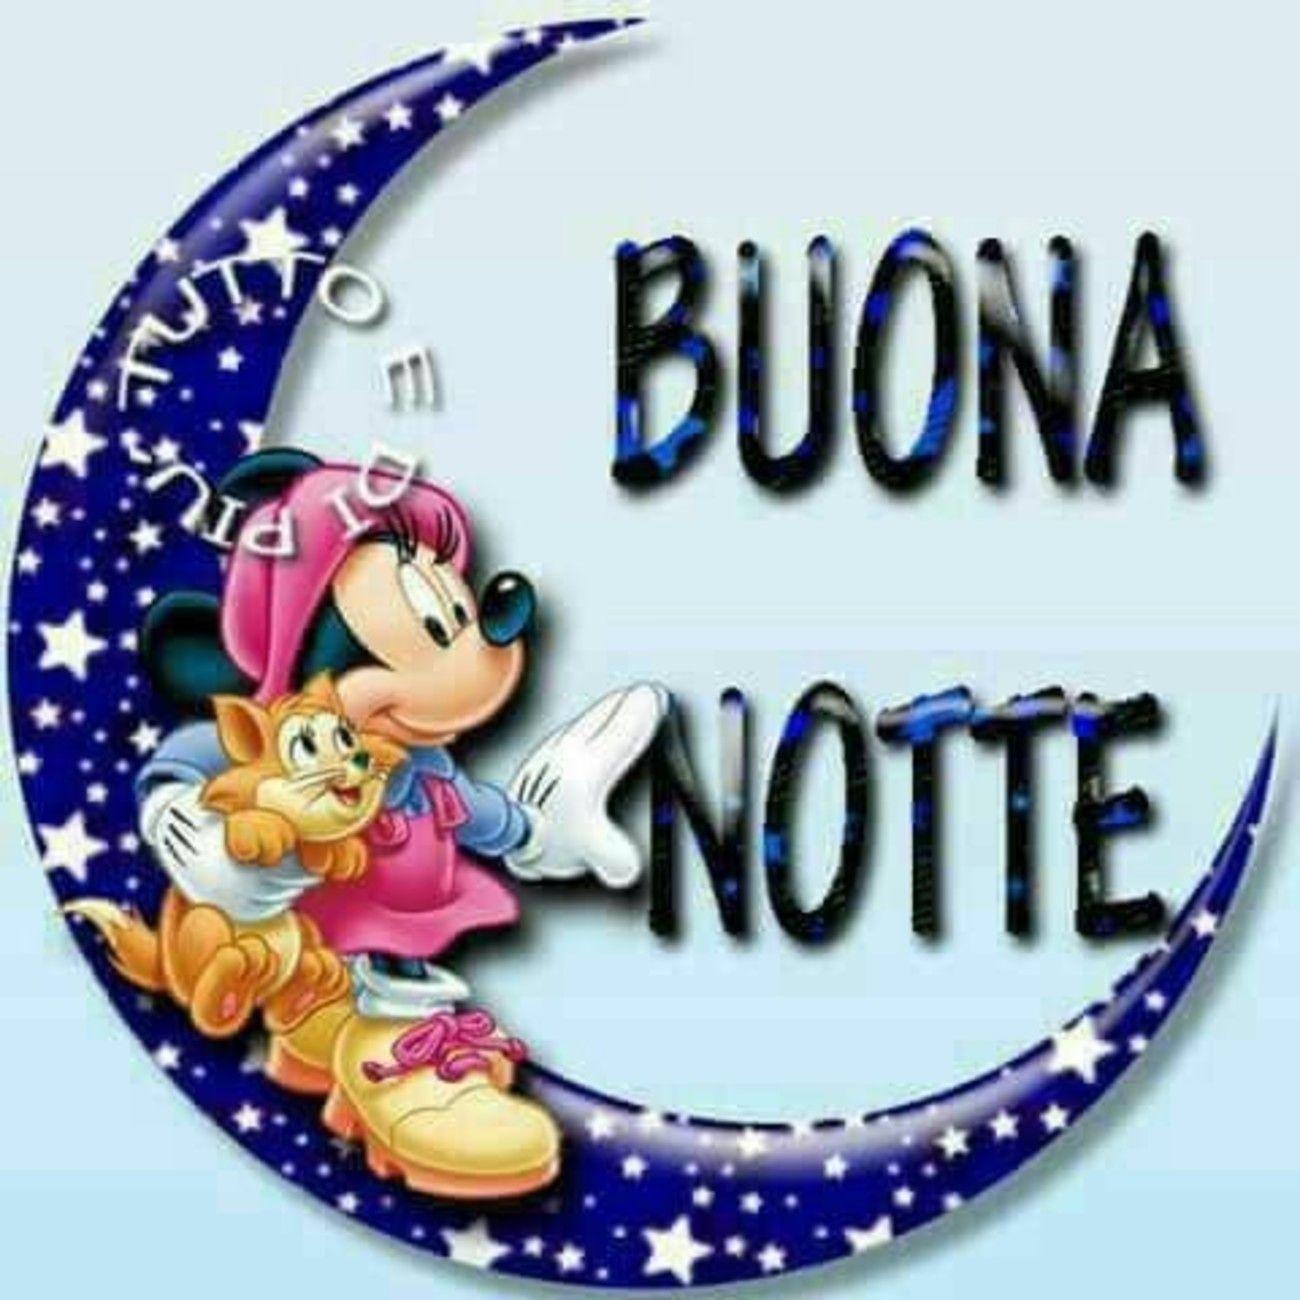 Felice Notte Frasi Buonanotte Immagini